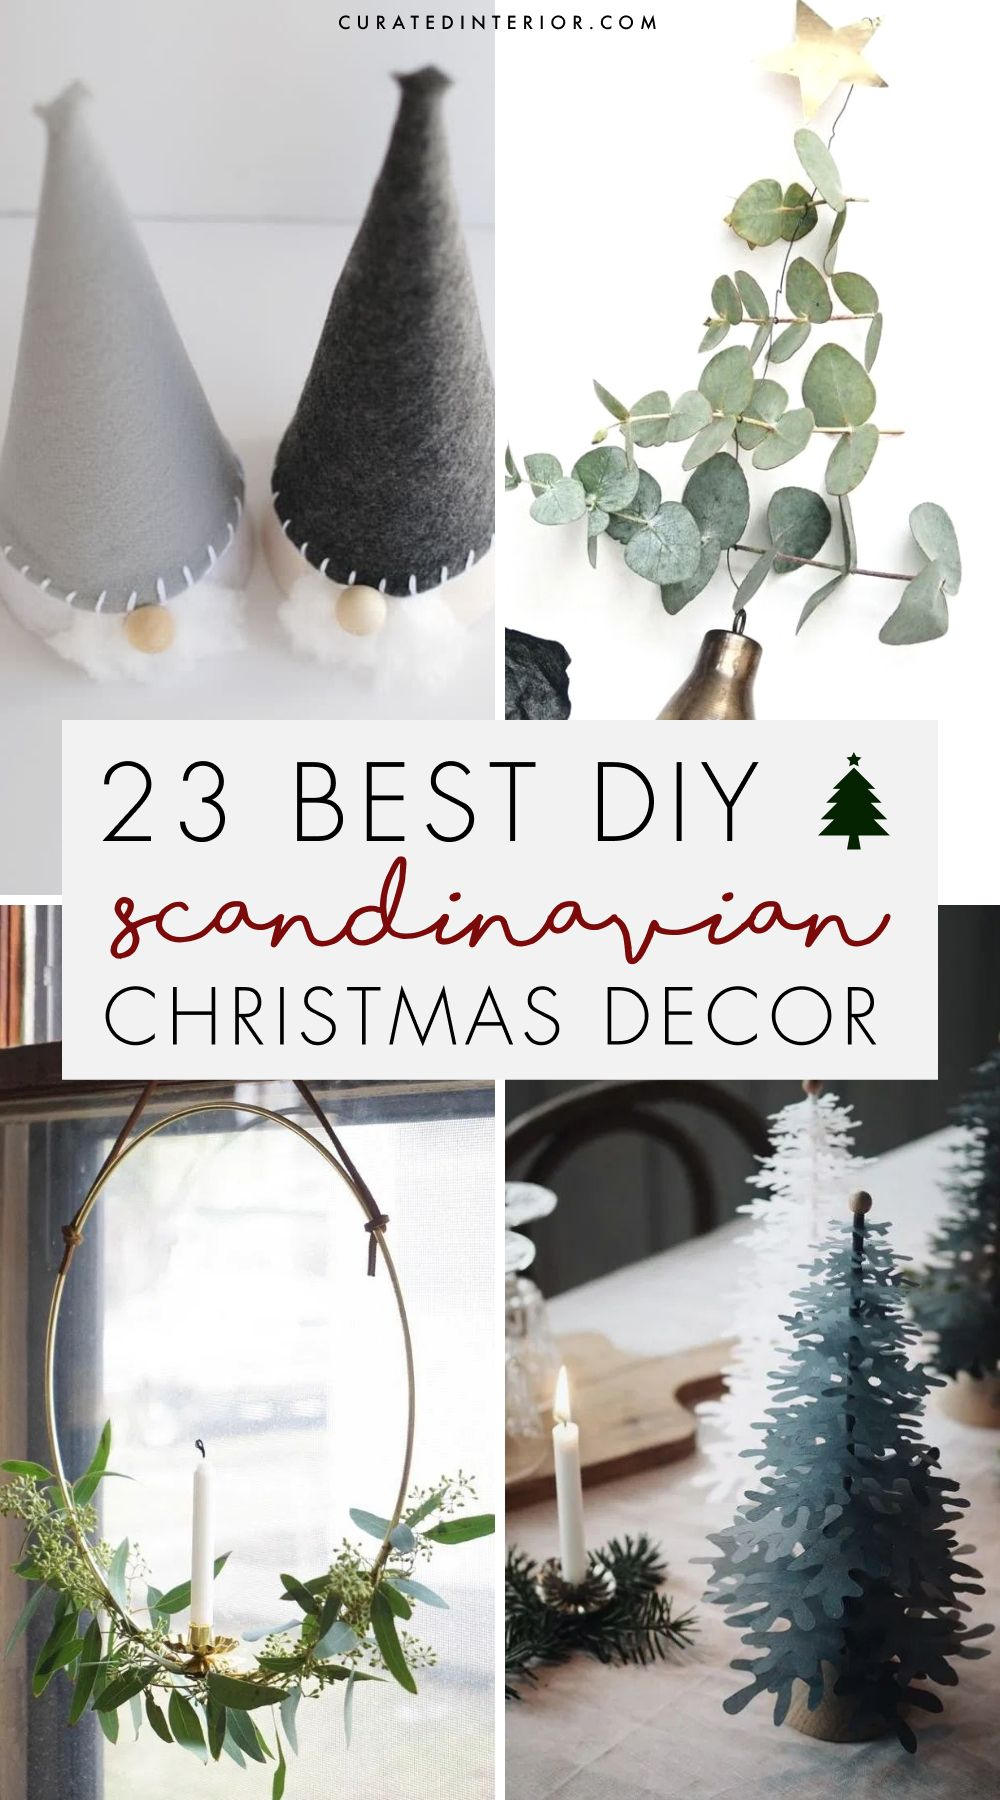 23 Best DIY Scandi Christmas Decor